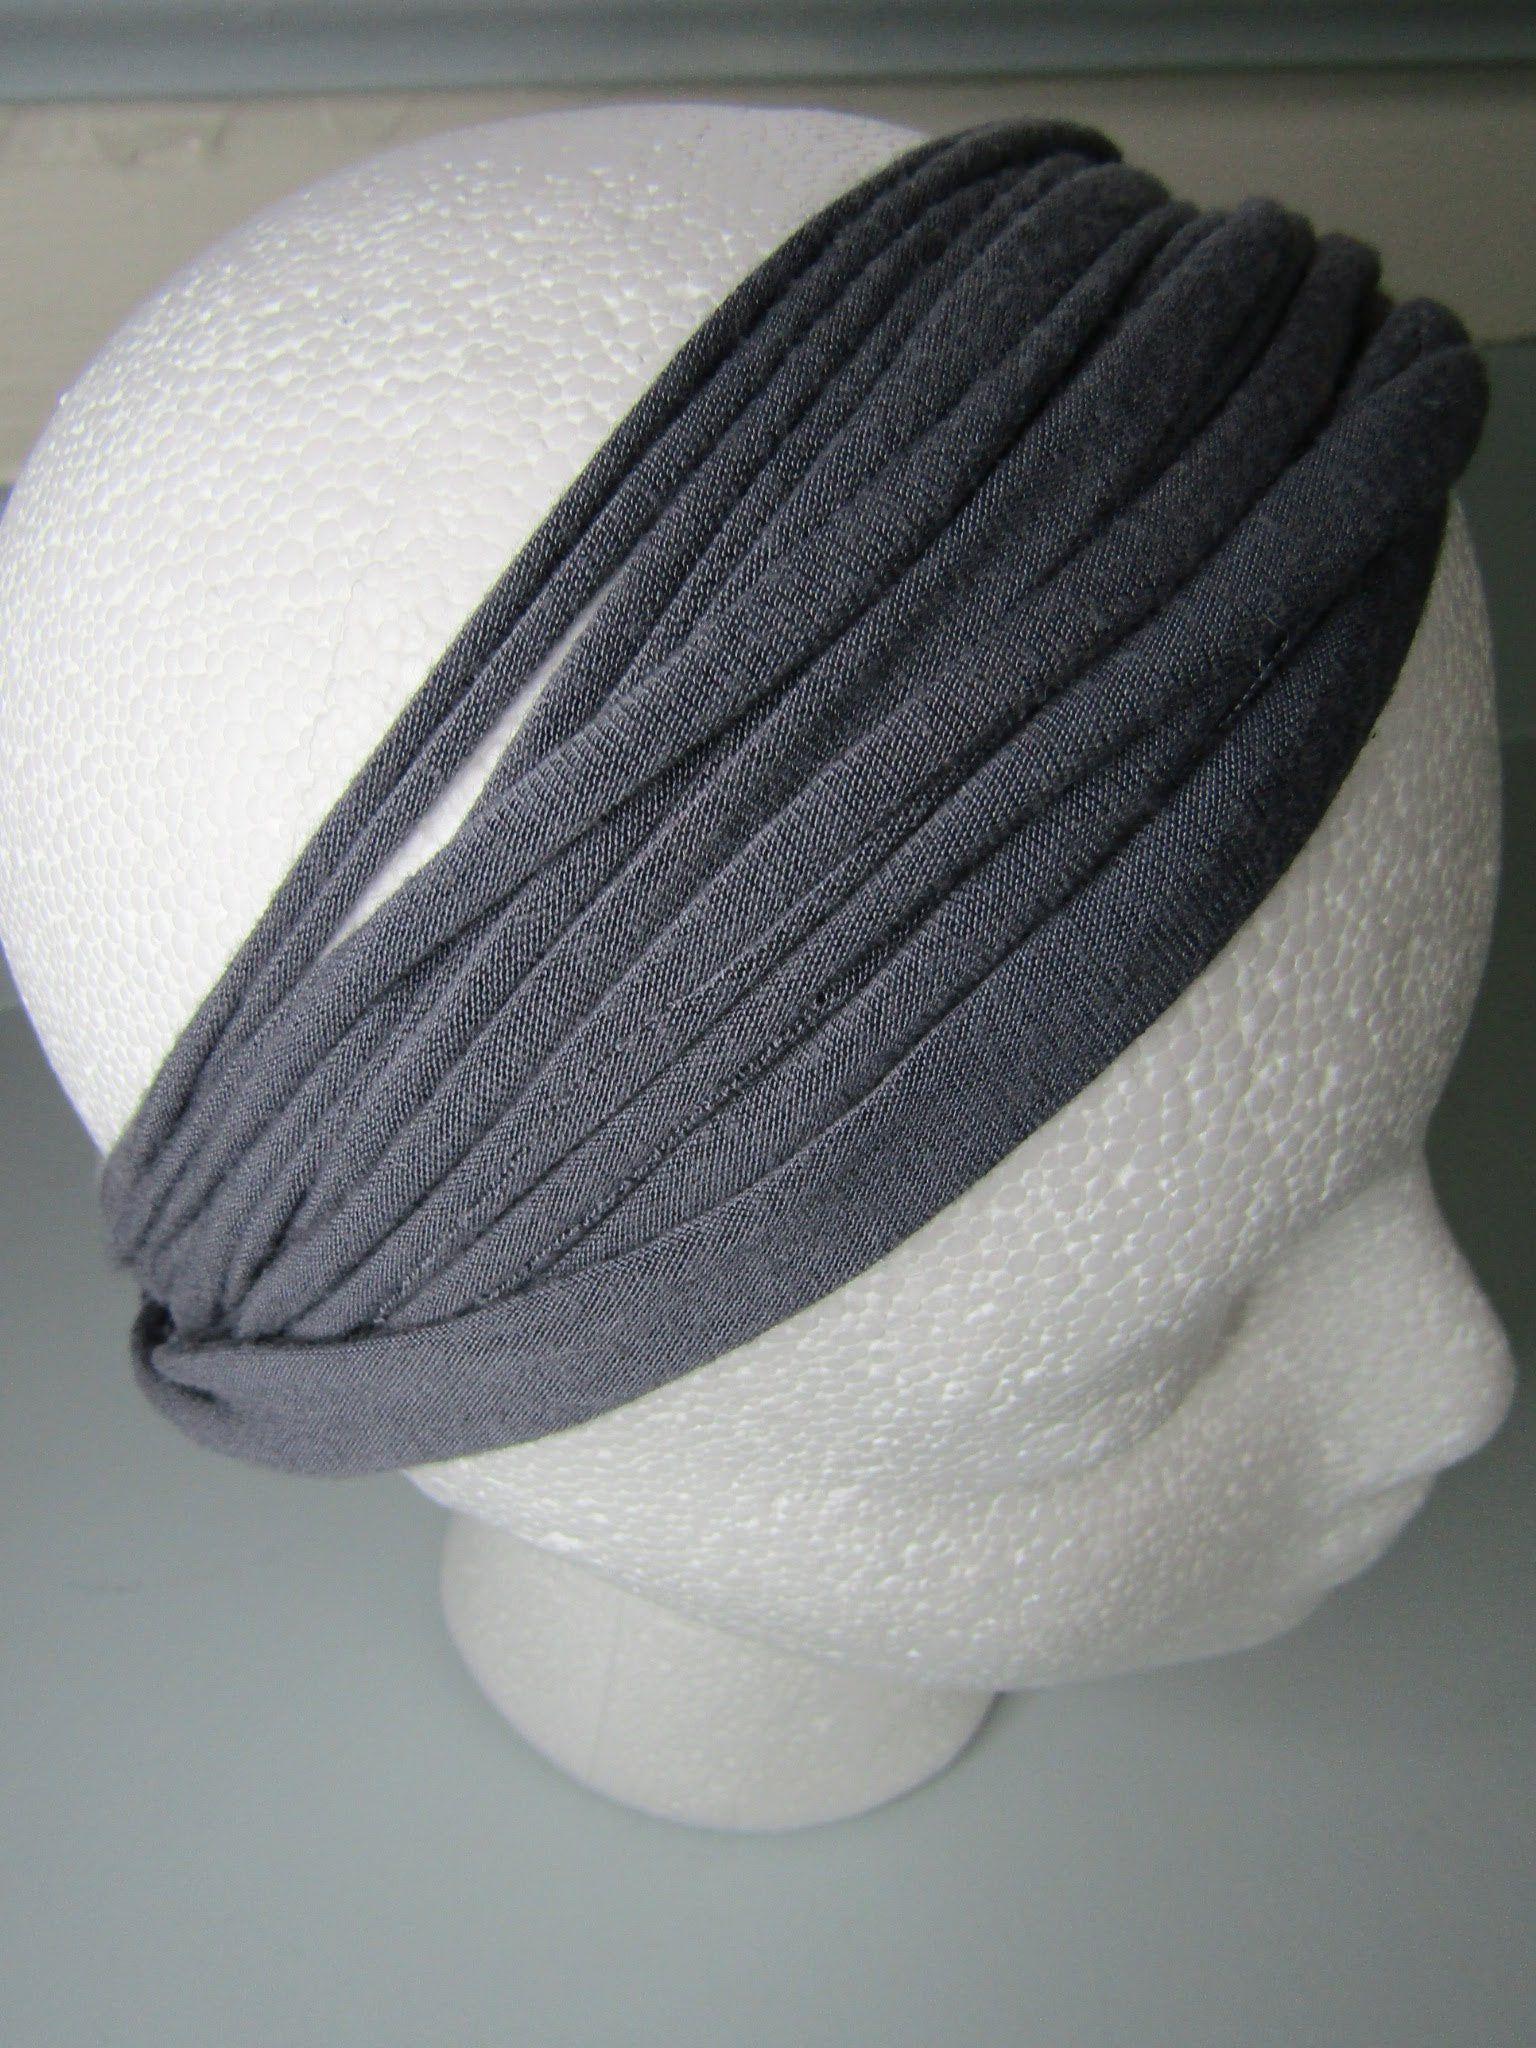 Headband - Yoga Headband - Stretch Headband - Hiking Headband